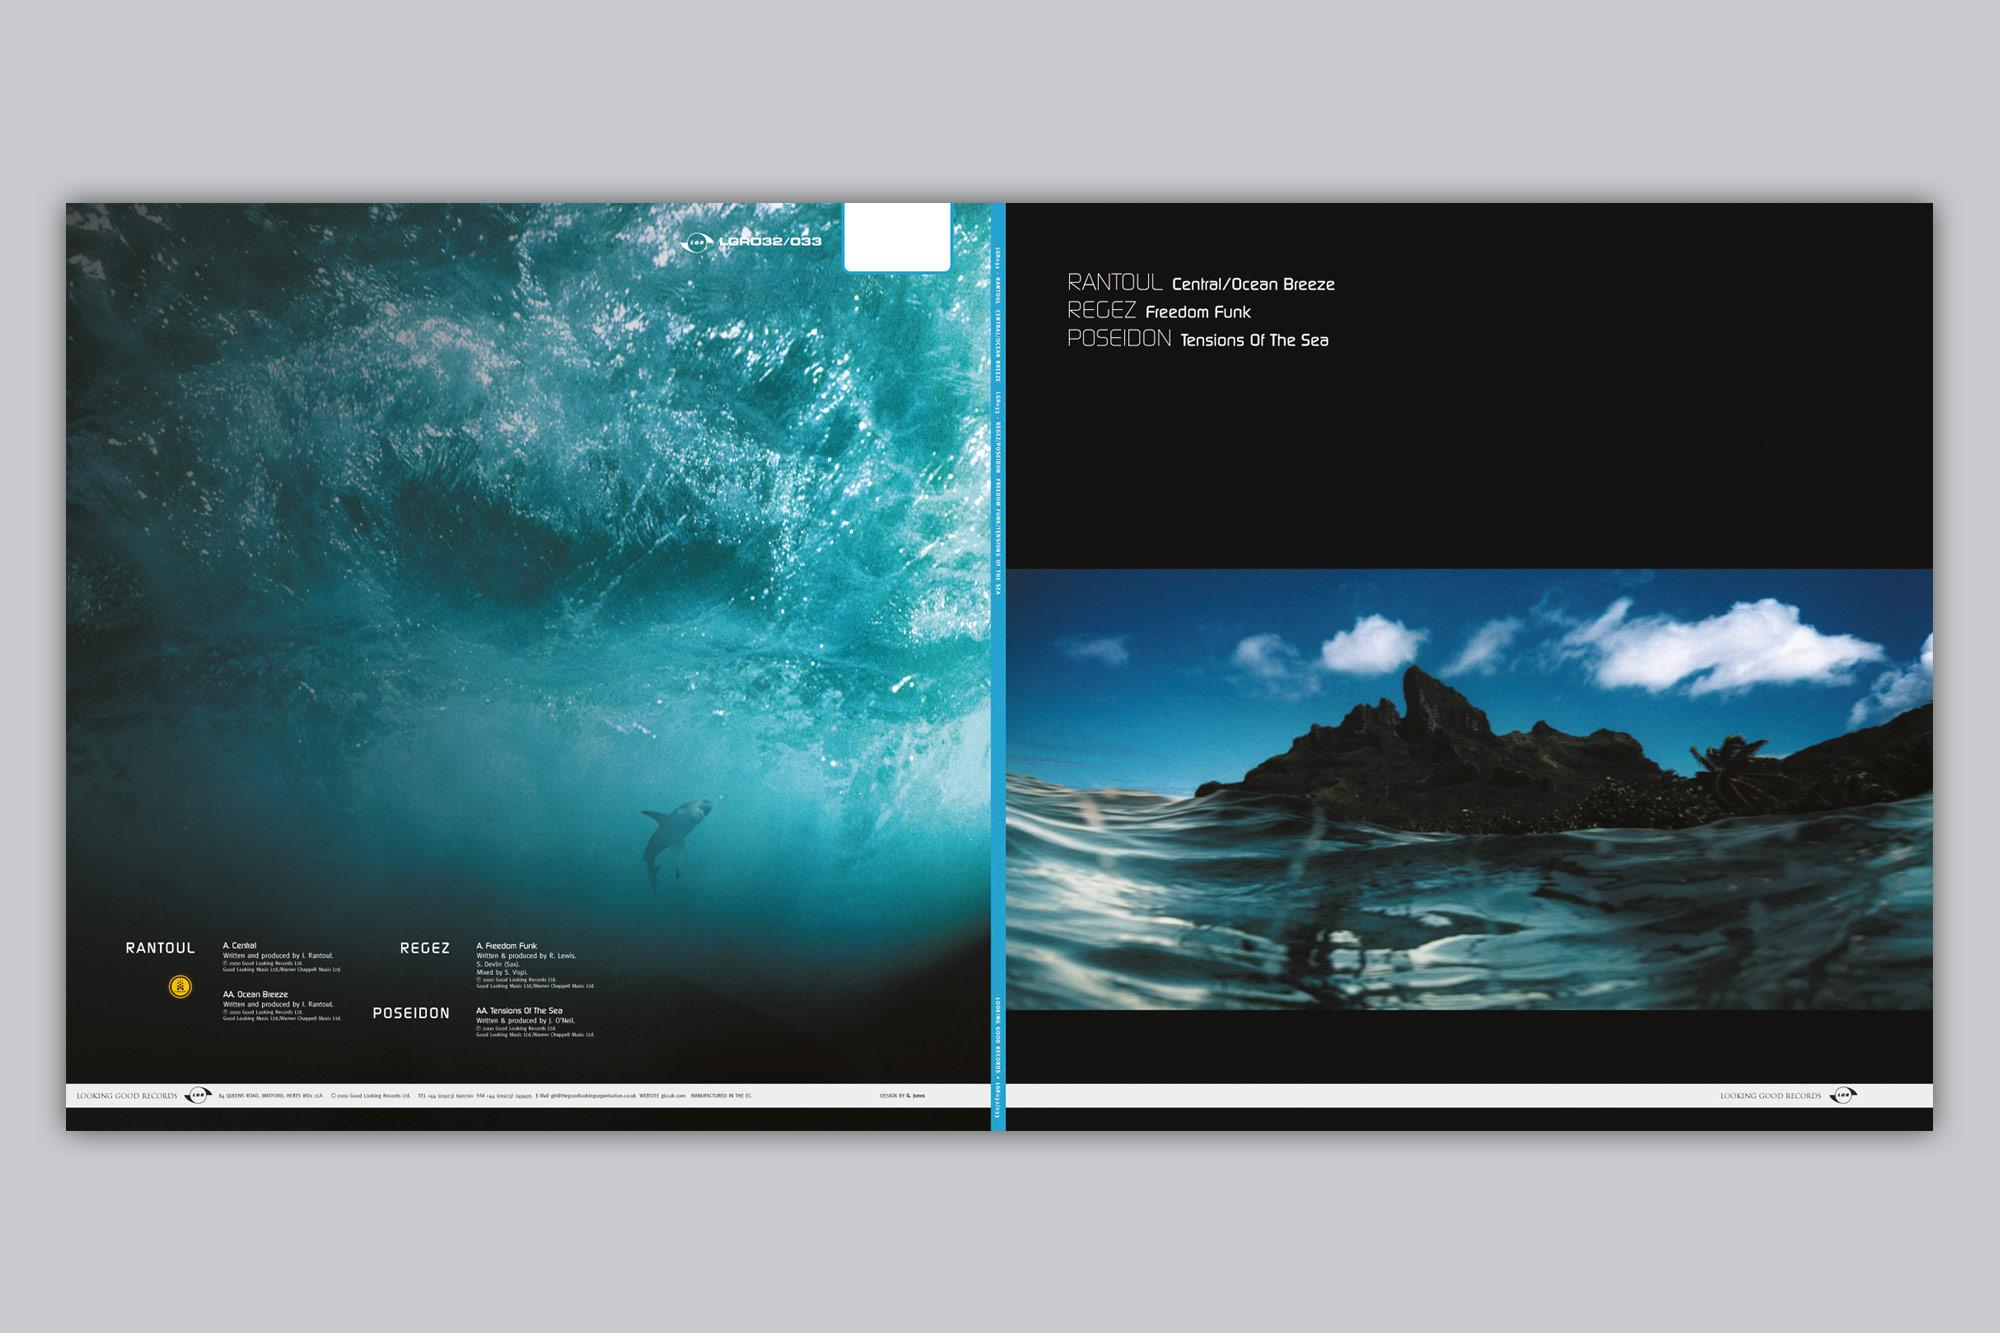 gareth-paul-jones-studio-design-looking-good-records-12-covers-cs-07-LGR032-LGR033-spread